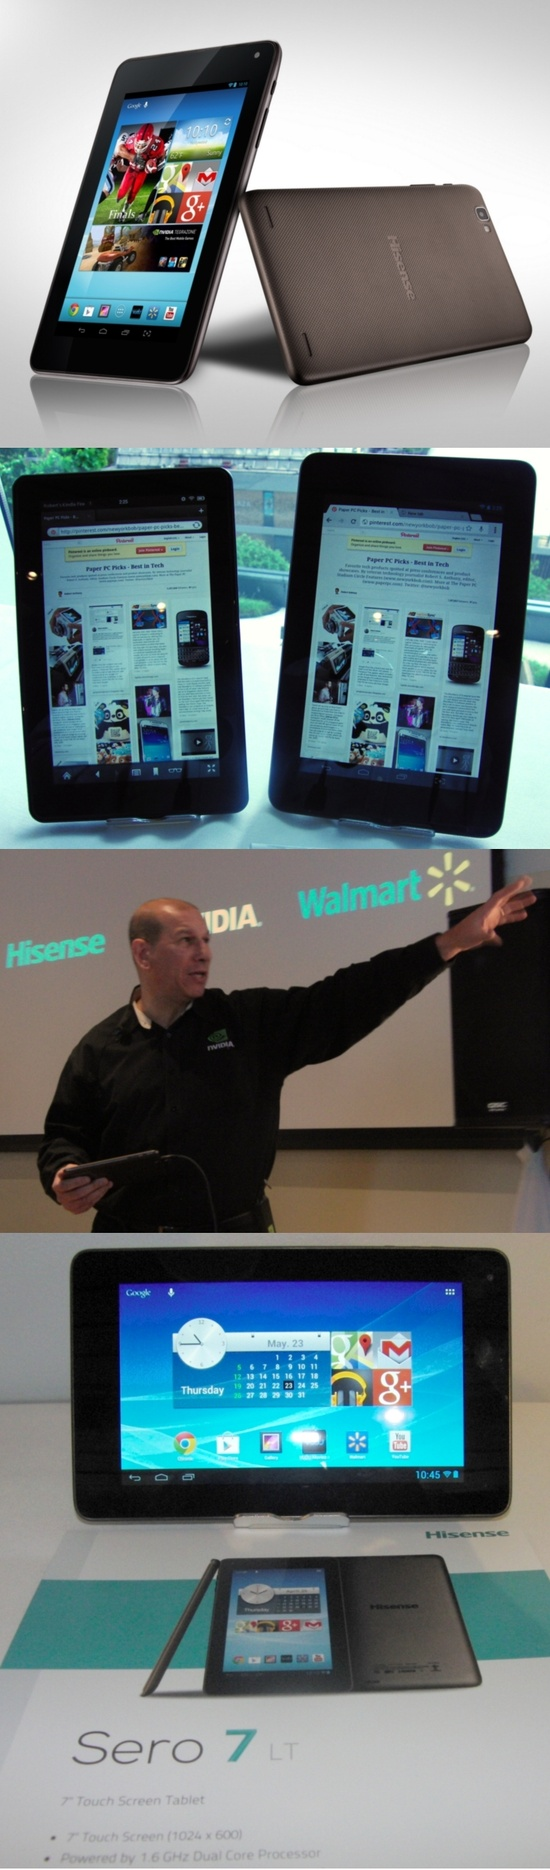 Hisense Sero 7 Pro tablet: All that for $150?